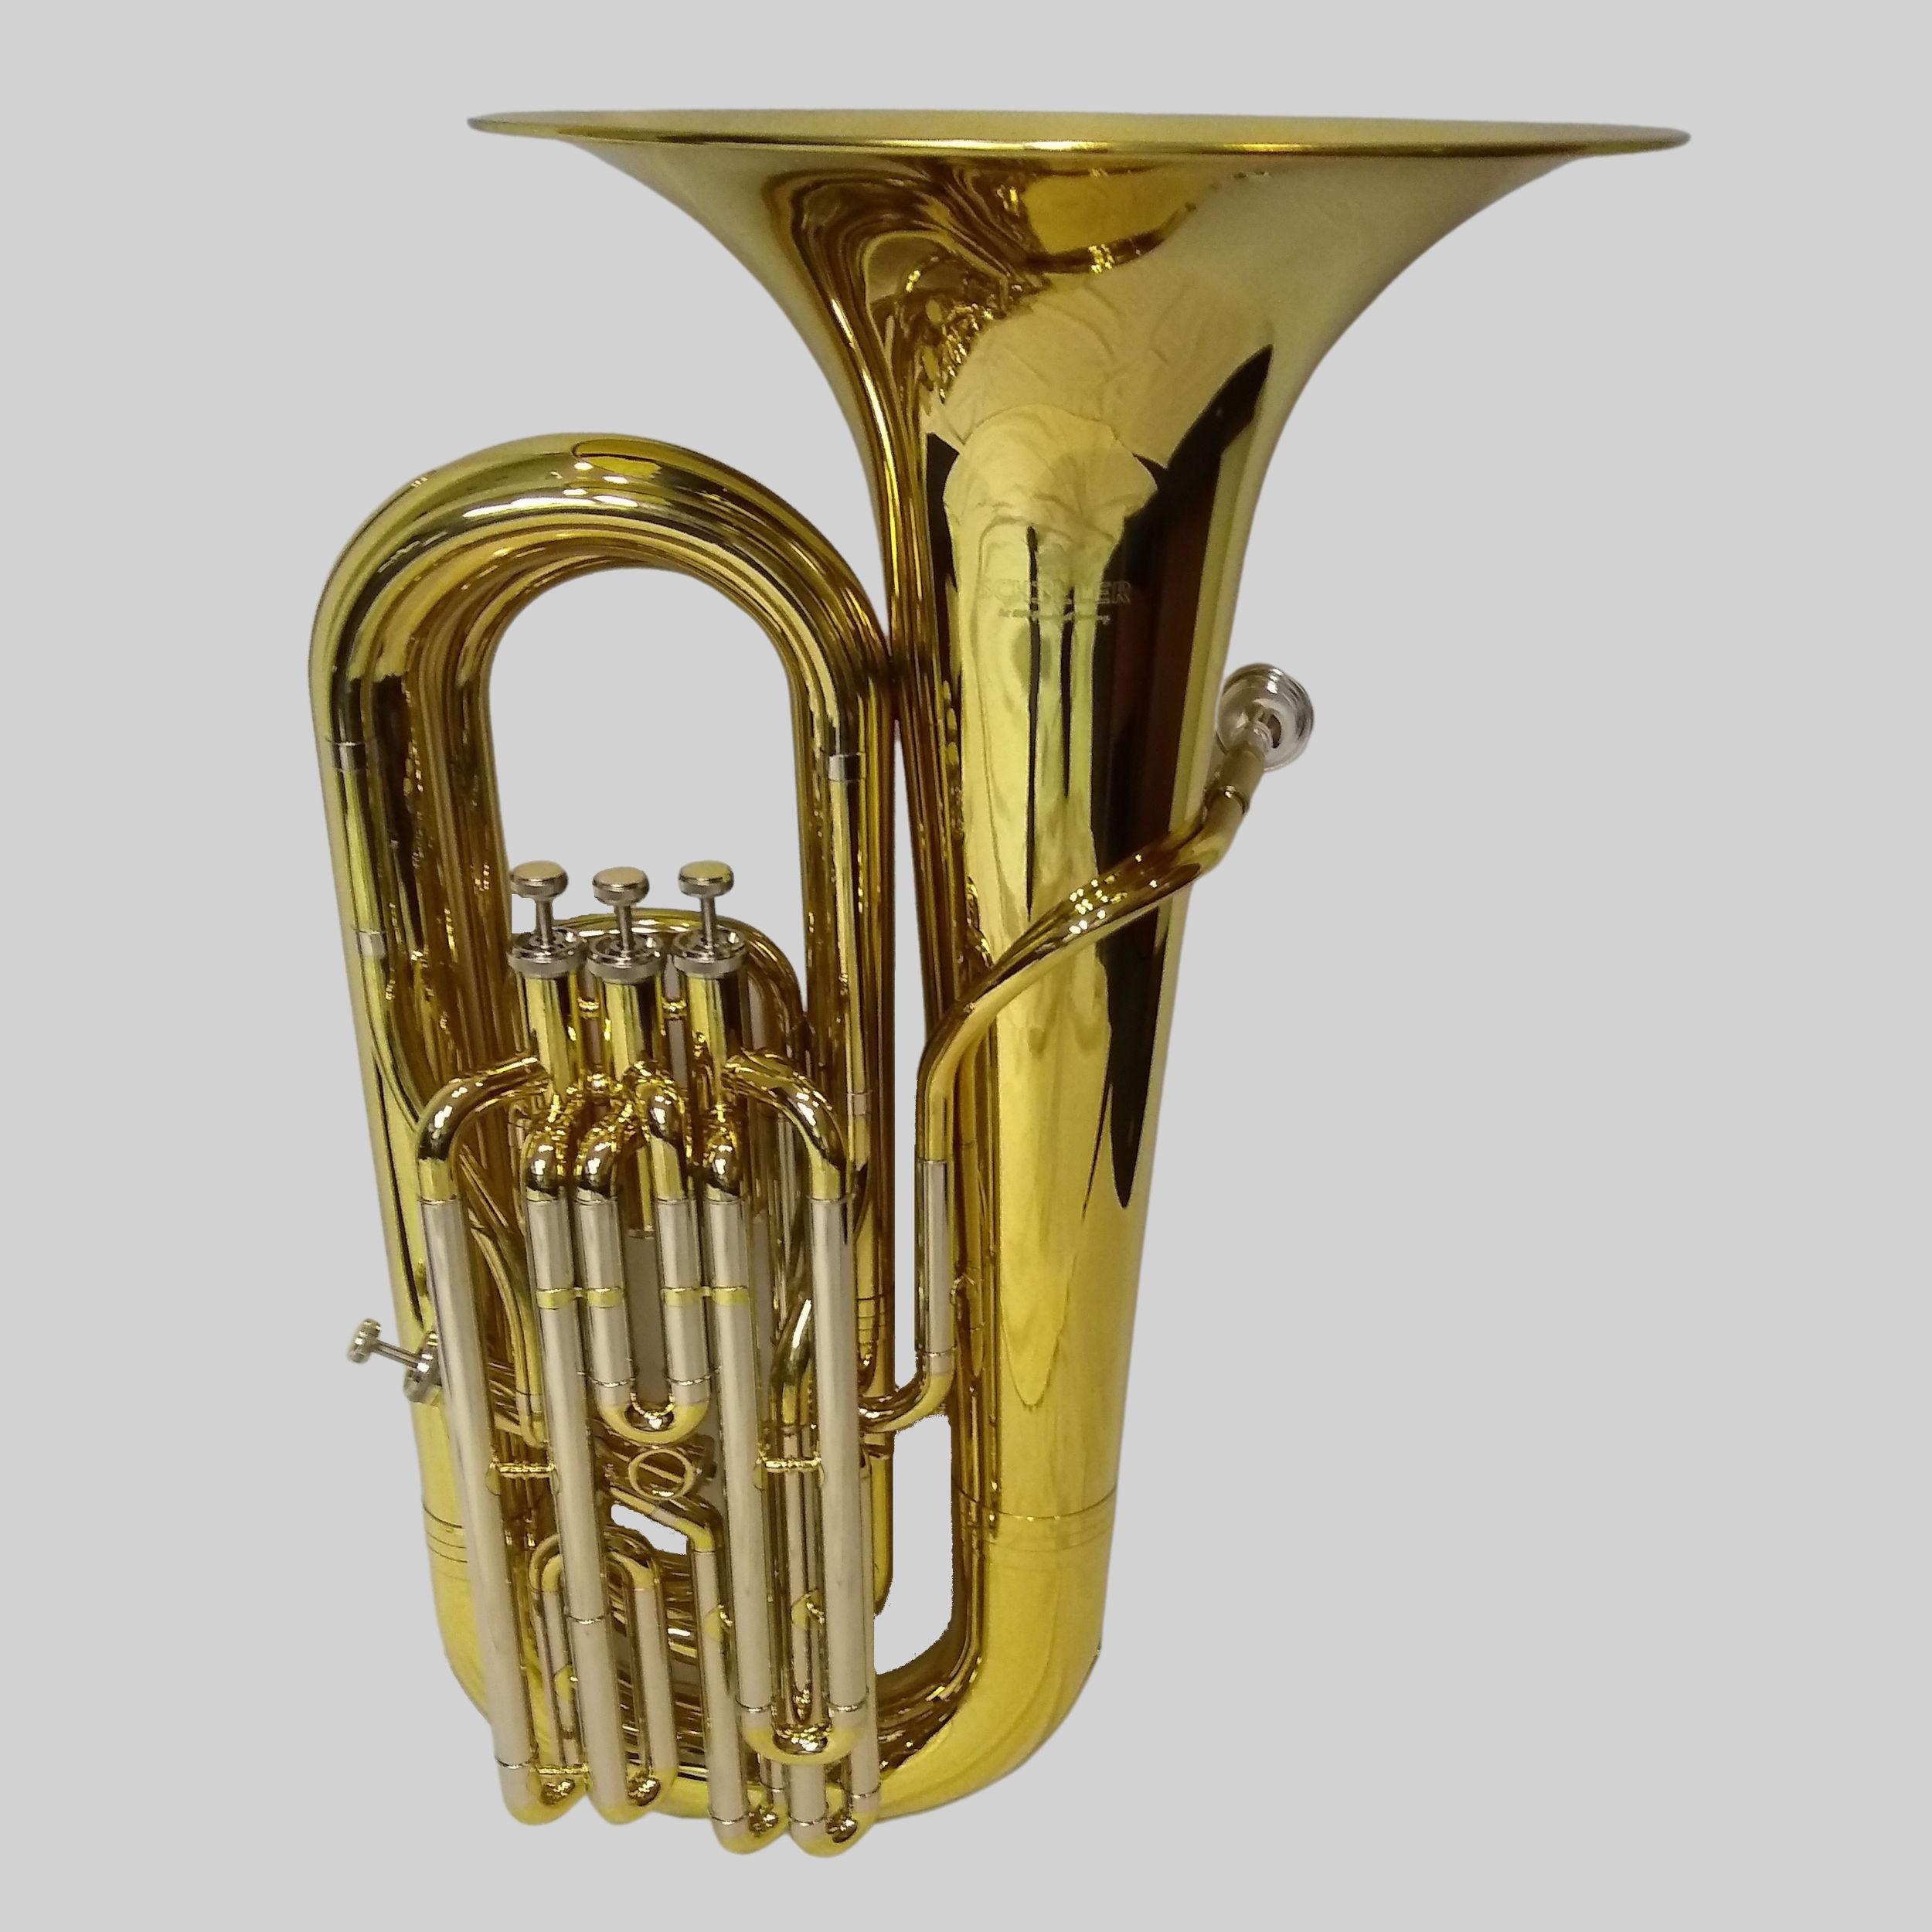 American Heritage 4 Valve Piston Sidekick BBb Tuba – Gold Lacquer